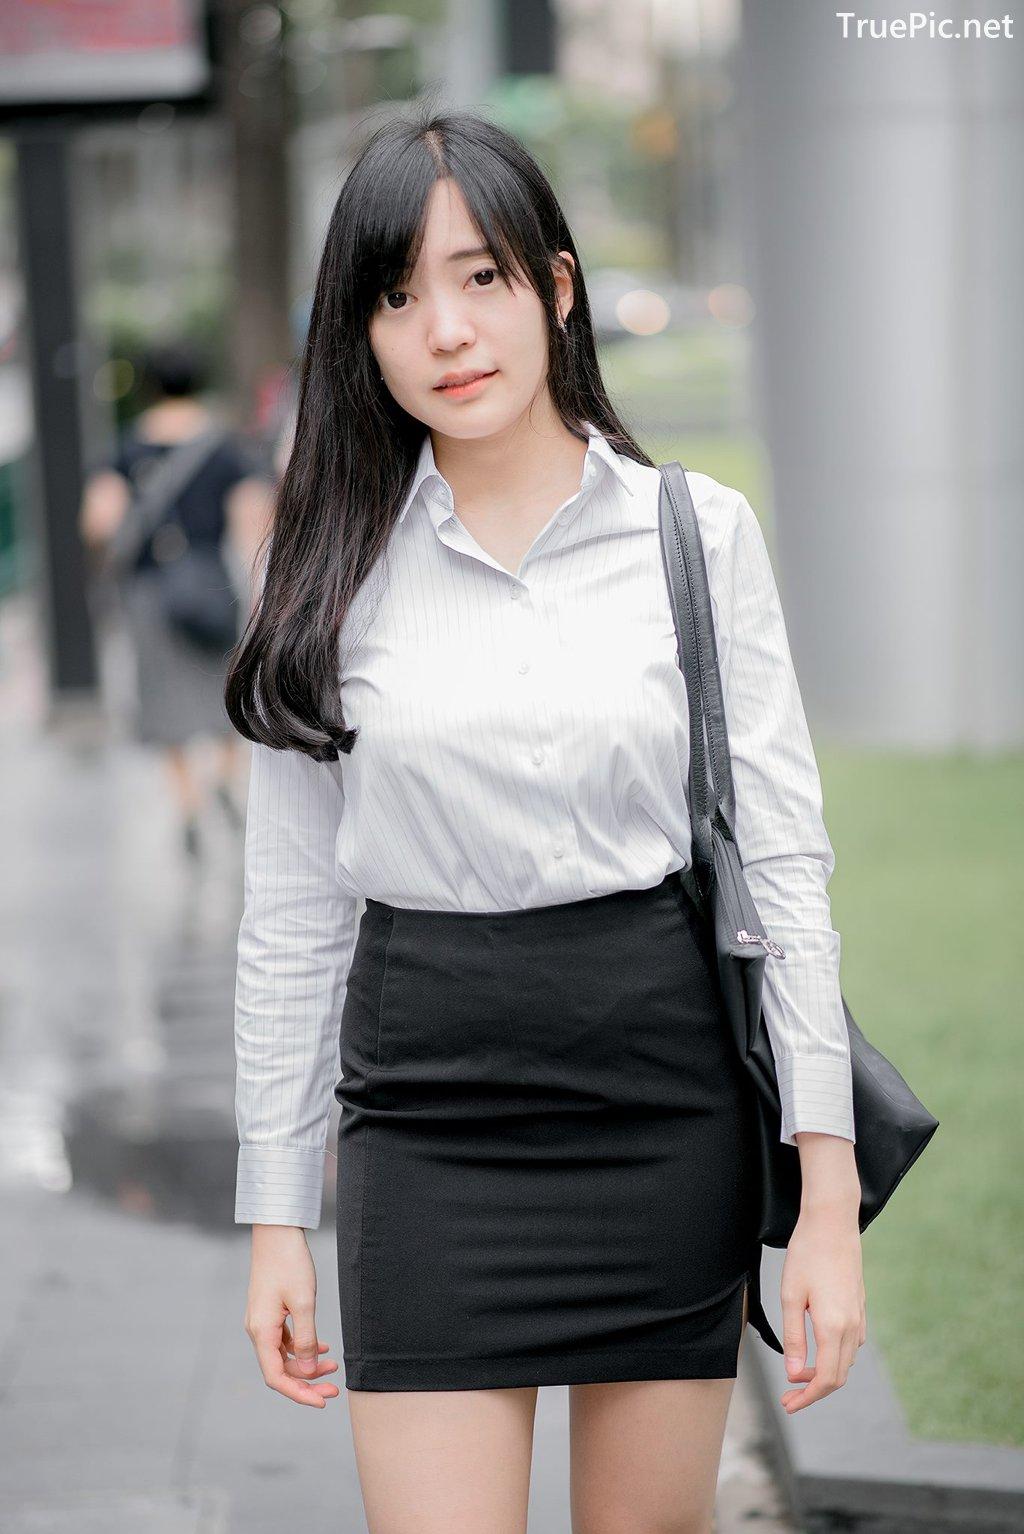 Image Thailand Model - Sarunrat Baifern Ong - Concept Kim's Secretary - TruePic.net - Picture-6